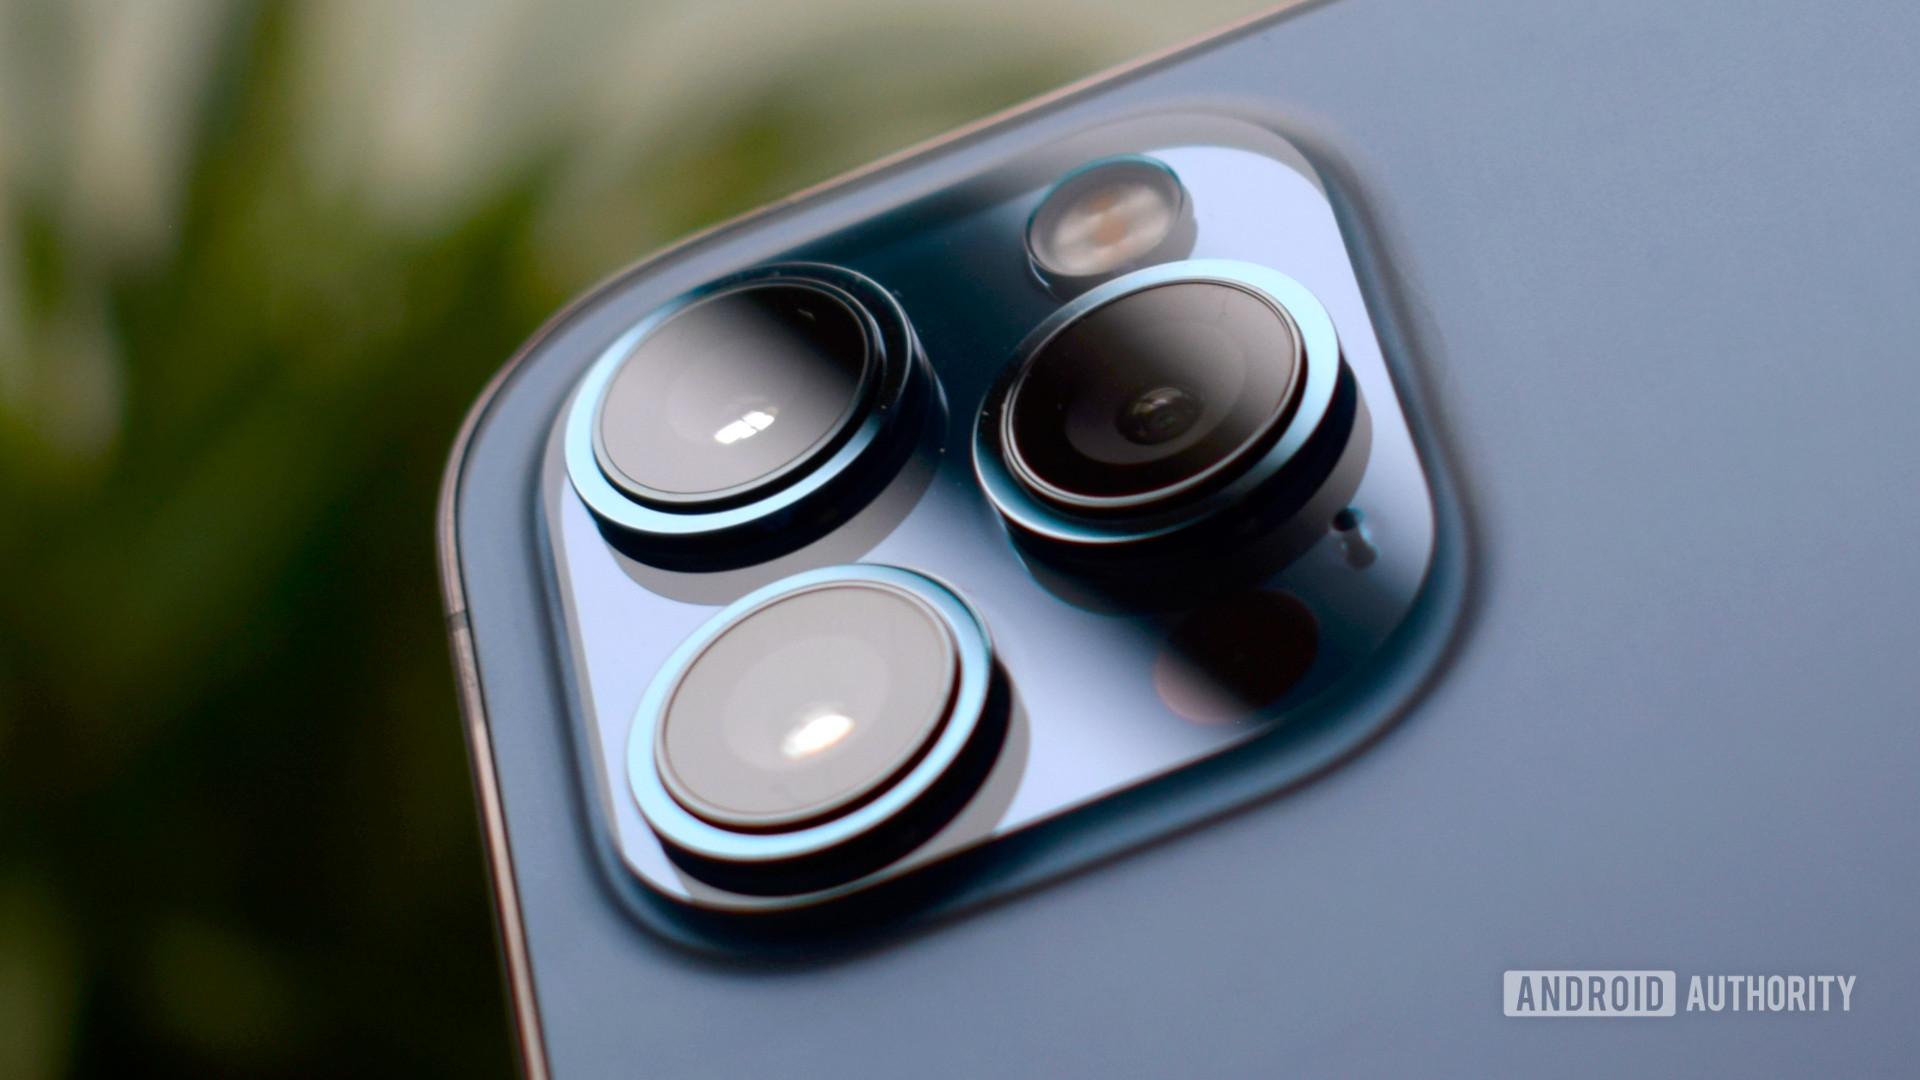 Apple iPhone 12 Max camera EOY 2020